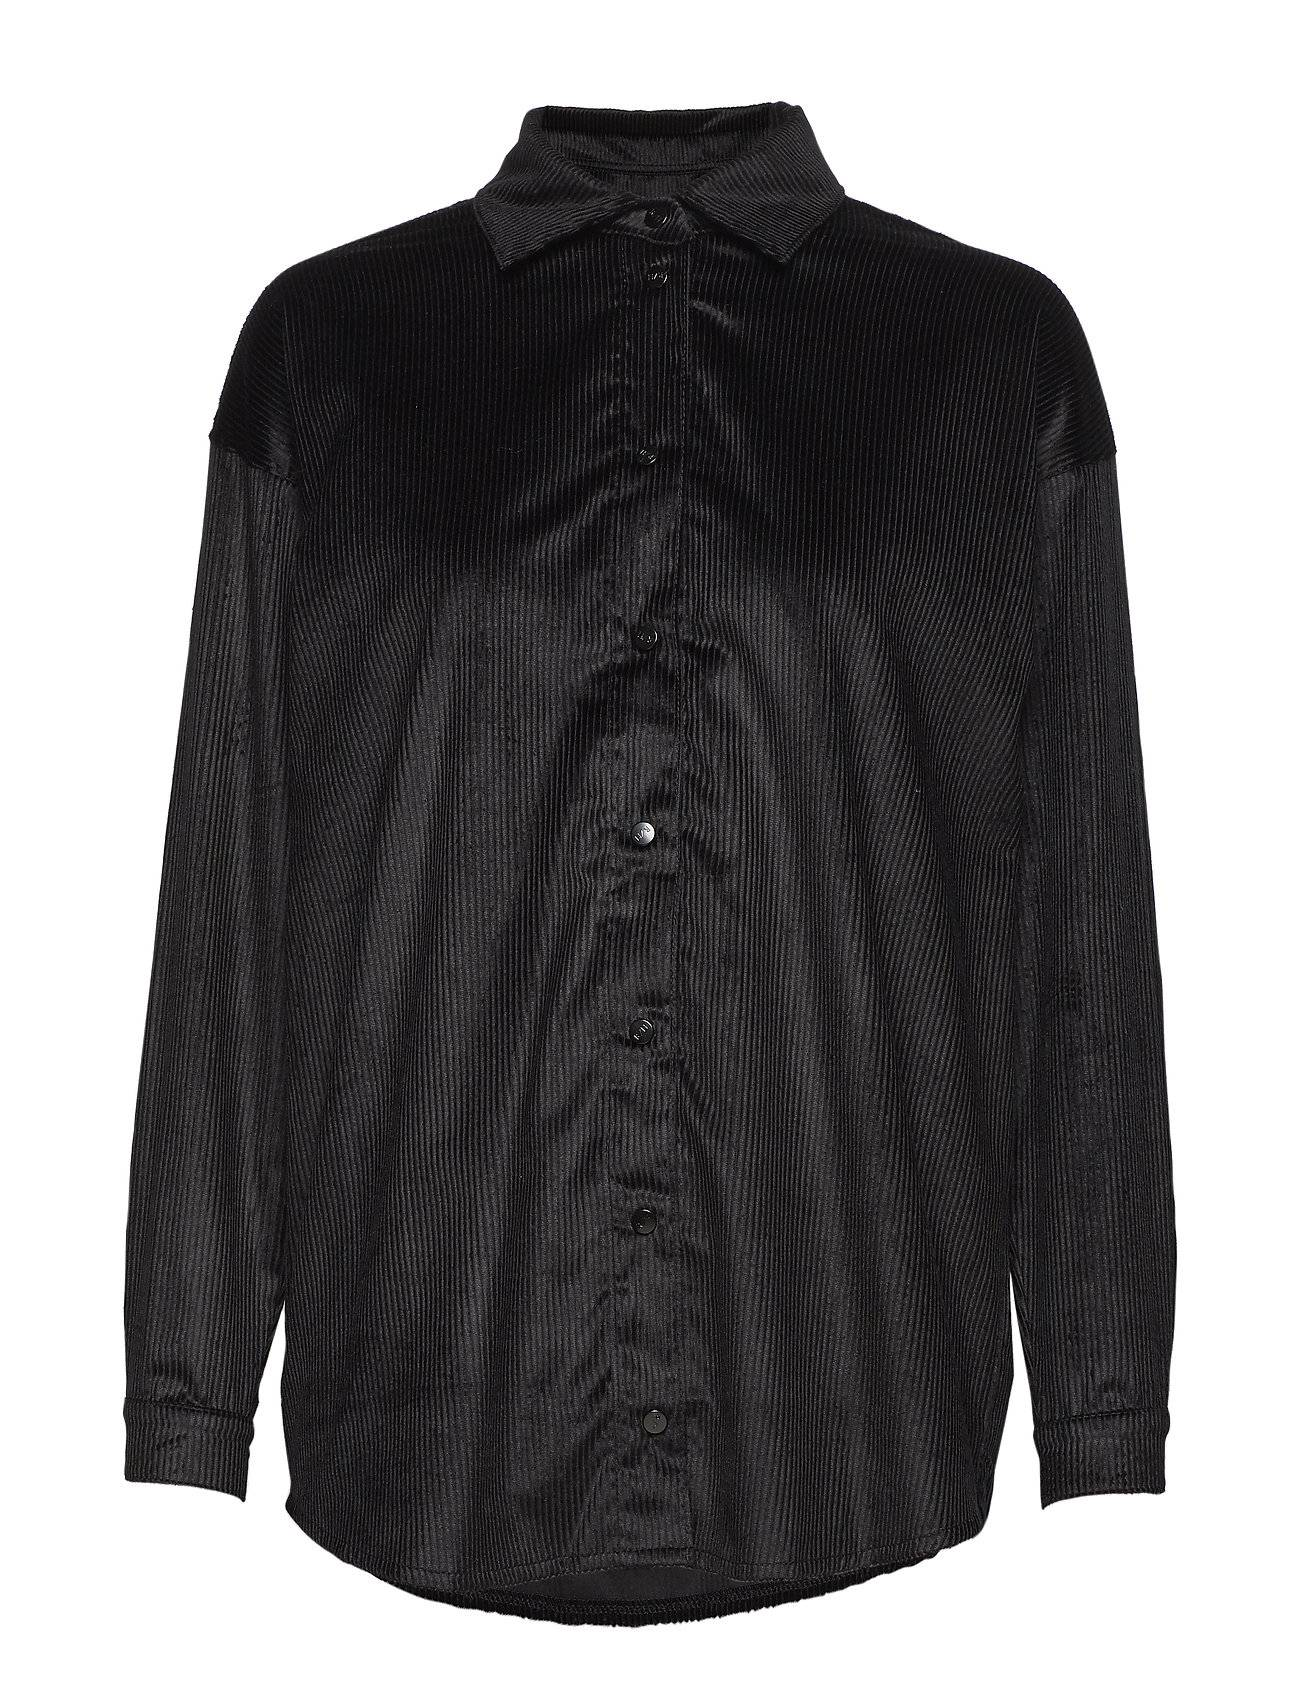 R/H Studio Abi Collar Shirt